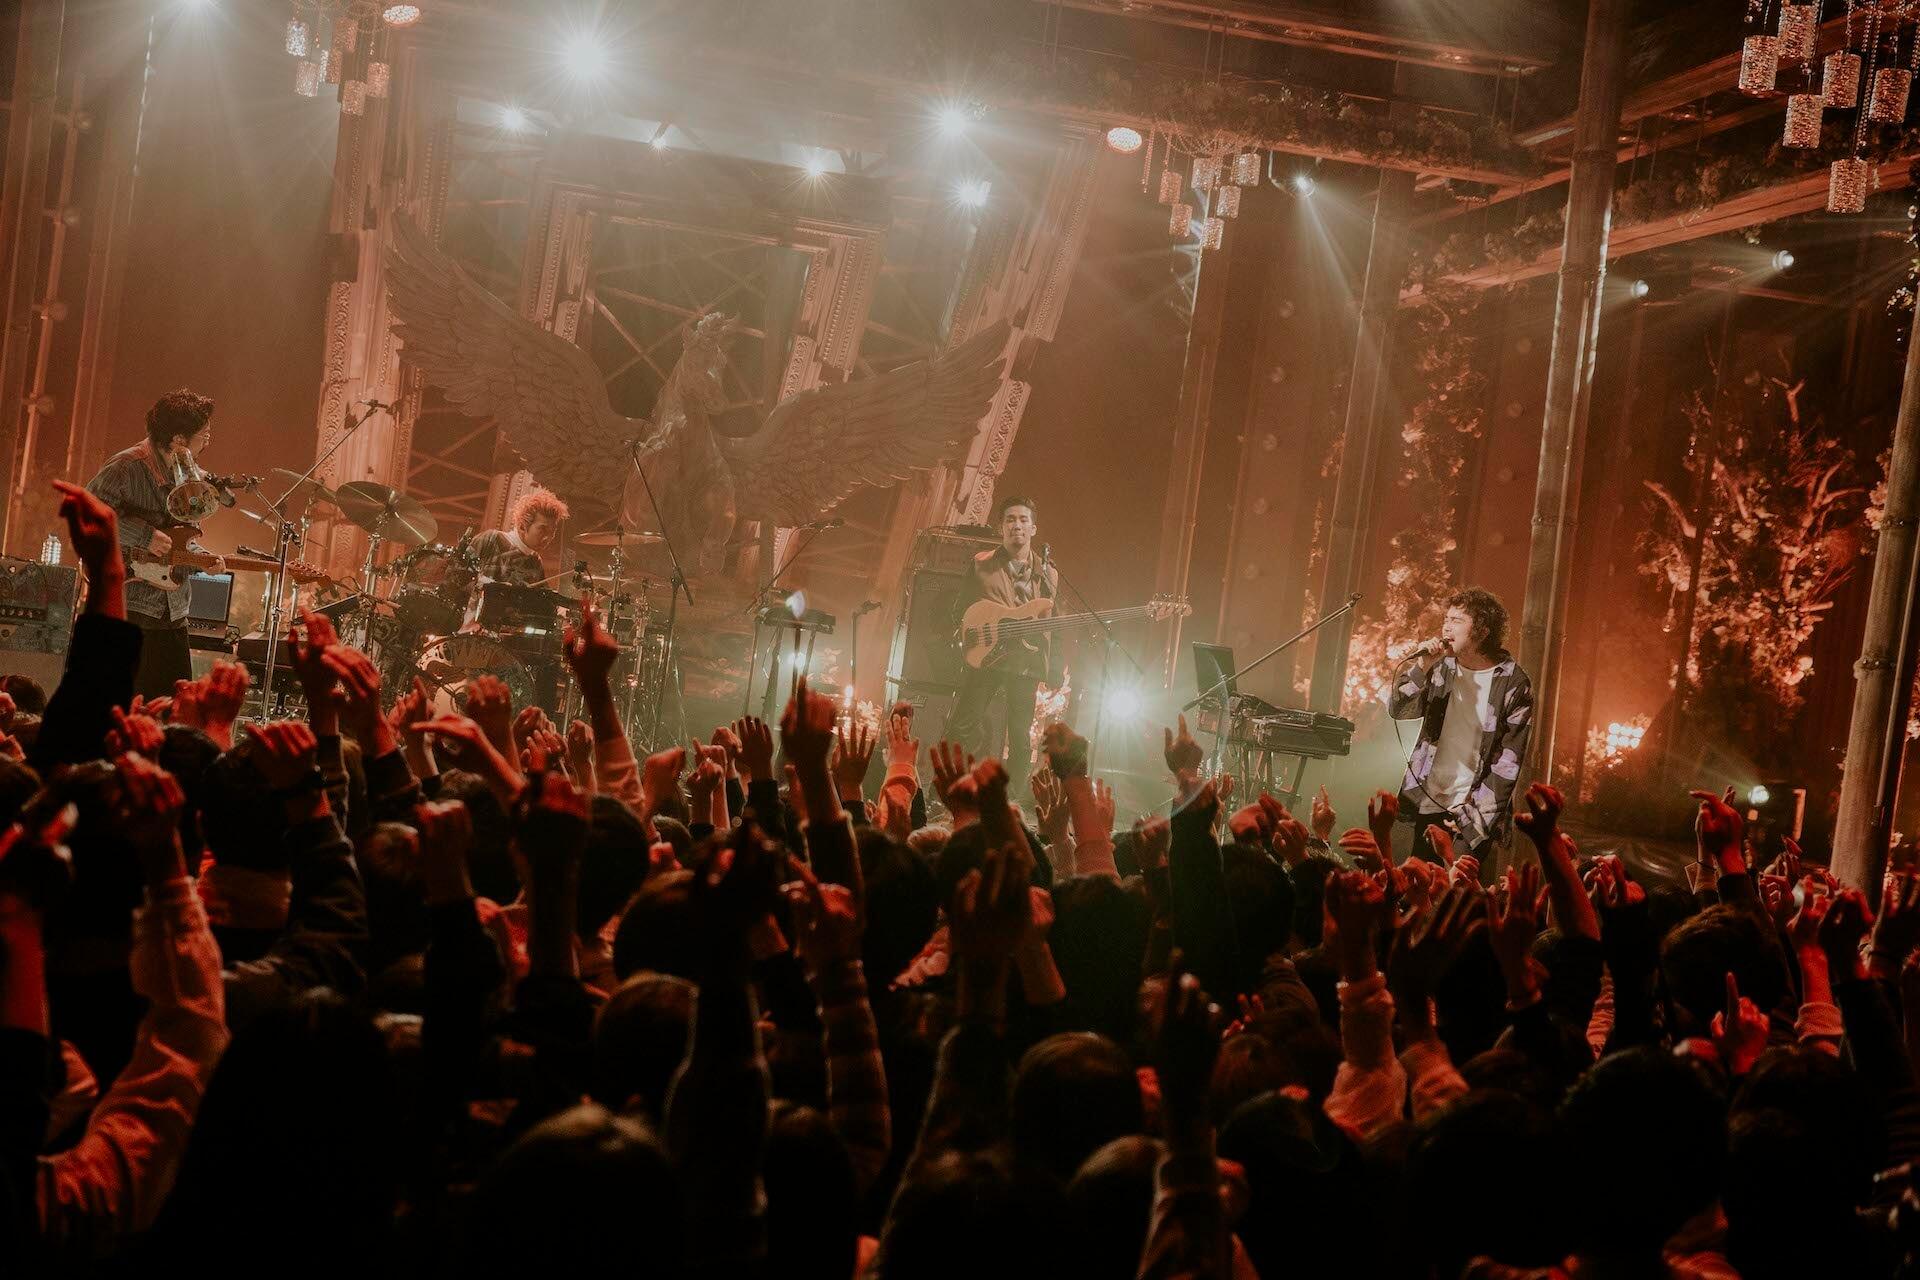 King Gnu「傘」「The hole」を地上波初披露!来週『Love music』特別番組放送決定 music200203_kinggnu_5